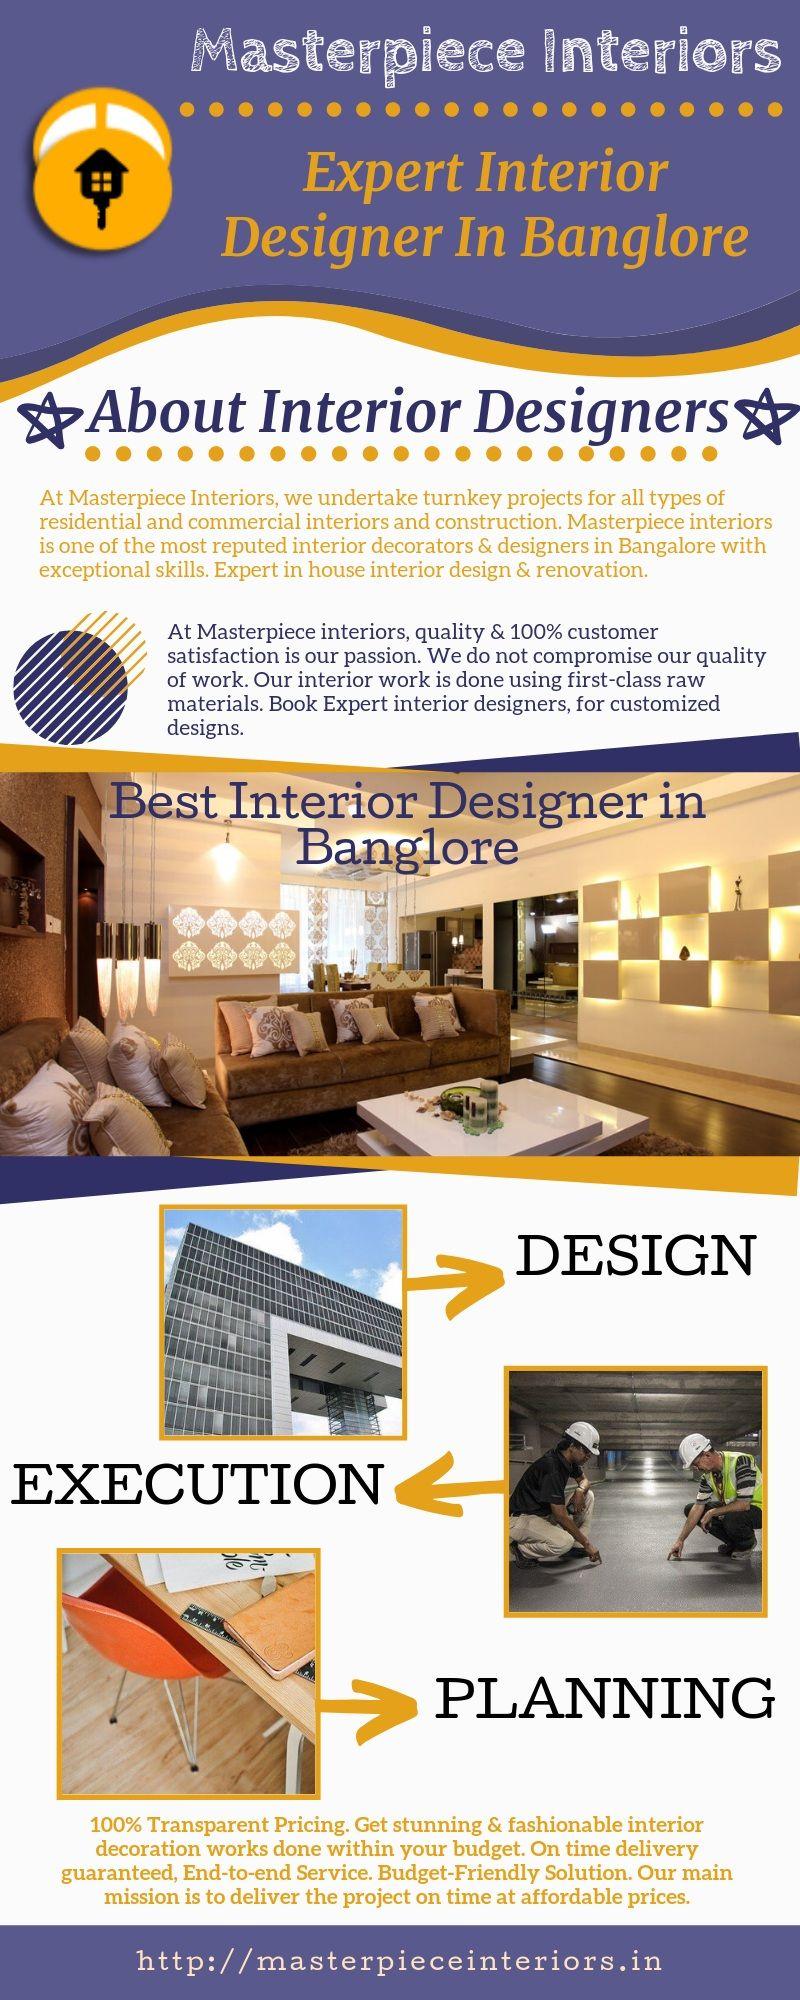 Pin By Master Piece Interiors On Best Interior Designers In Bangalore Interior Design Companies Interior Work Commercial Interiors